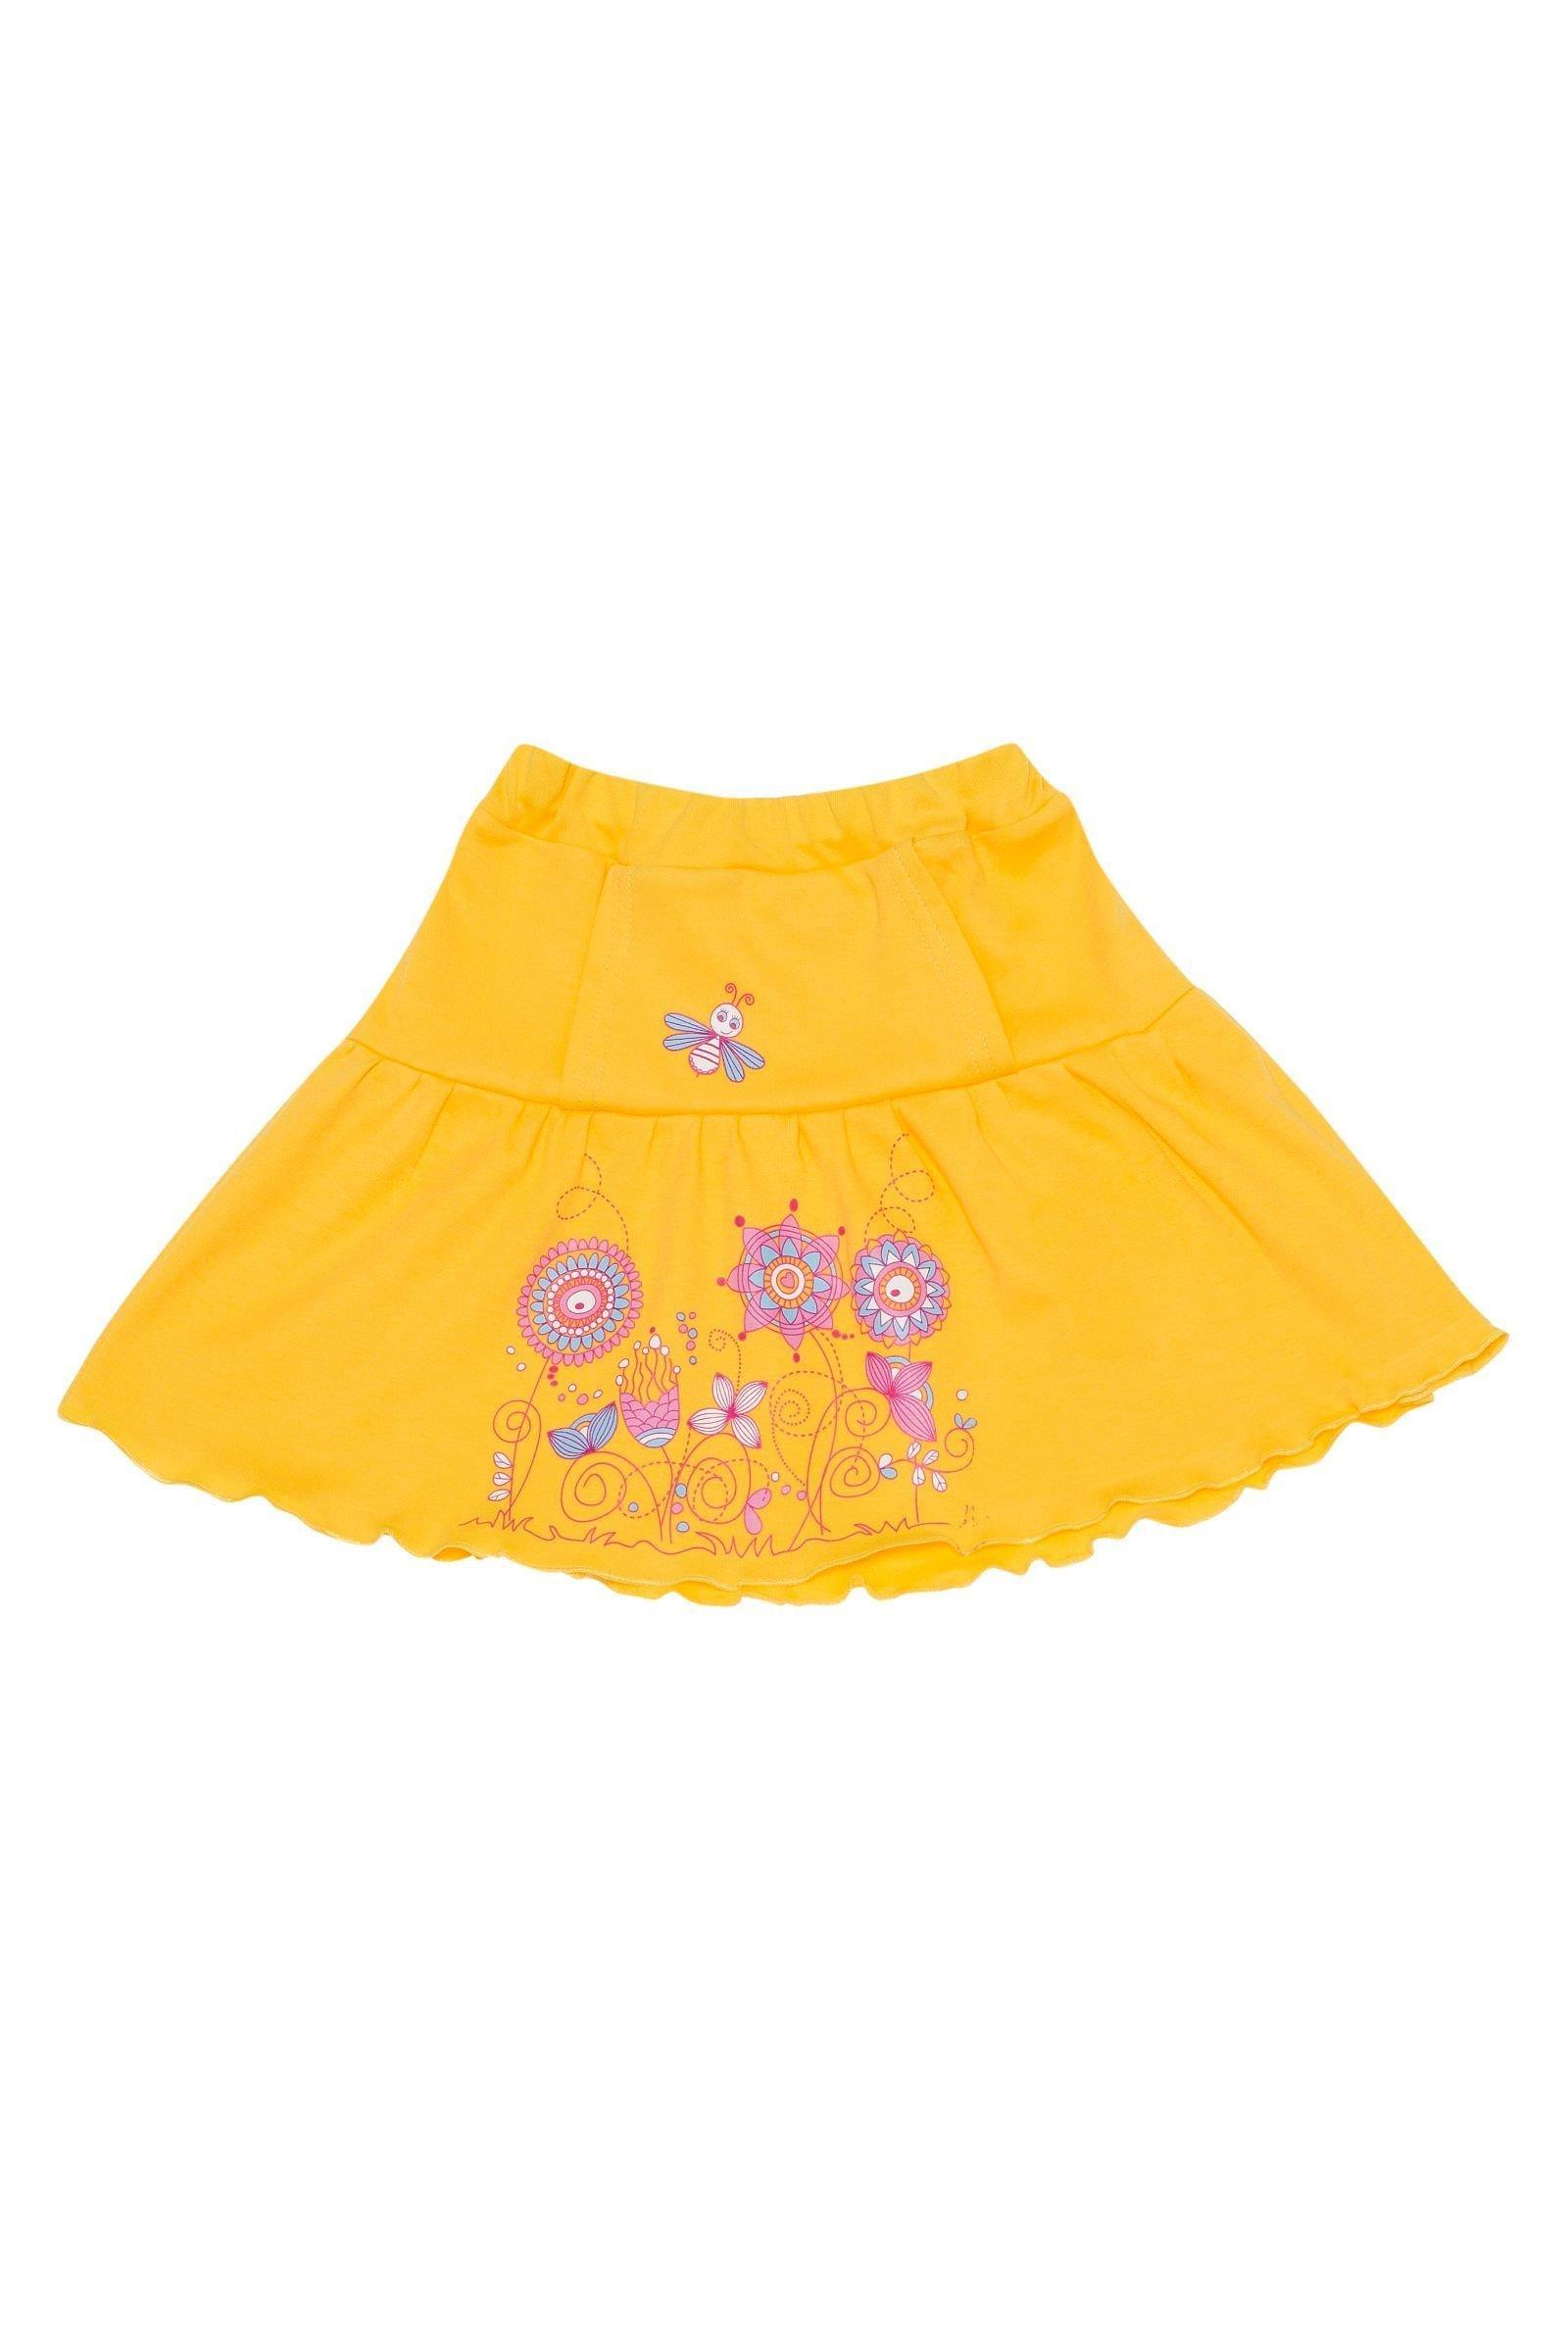 Юбка для девочки ALLAL01-725